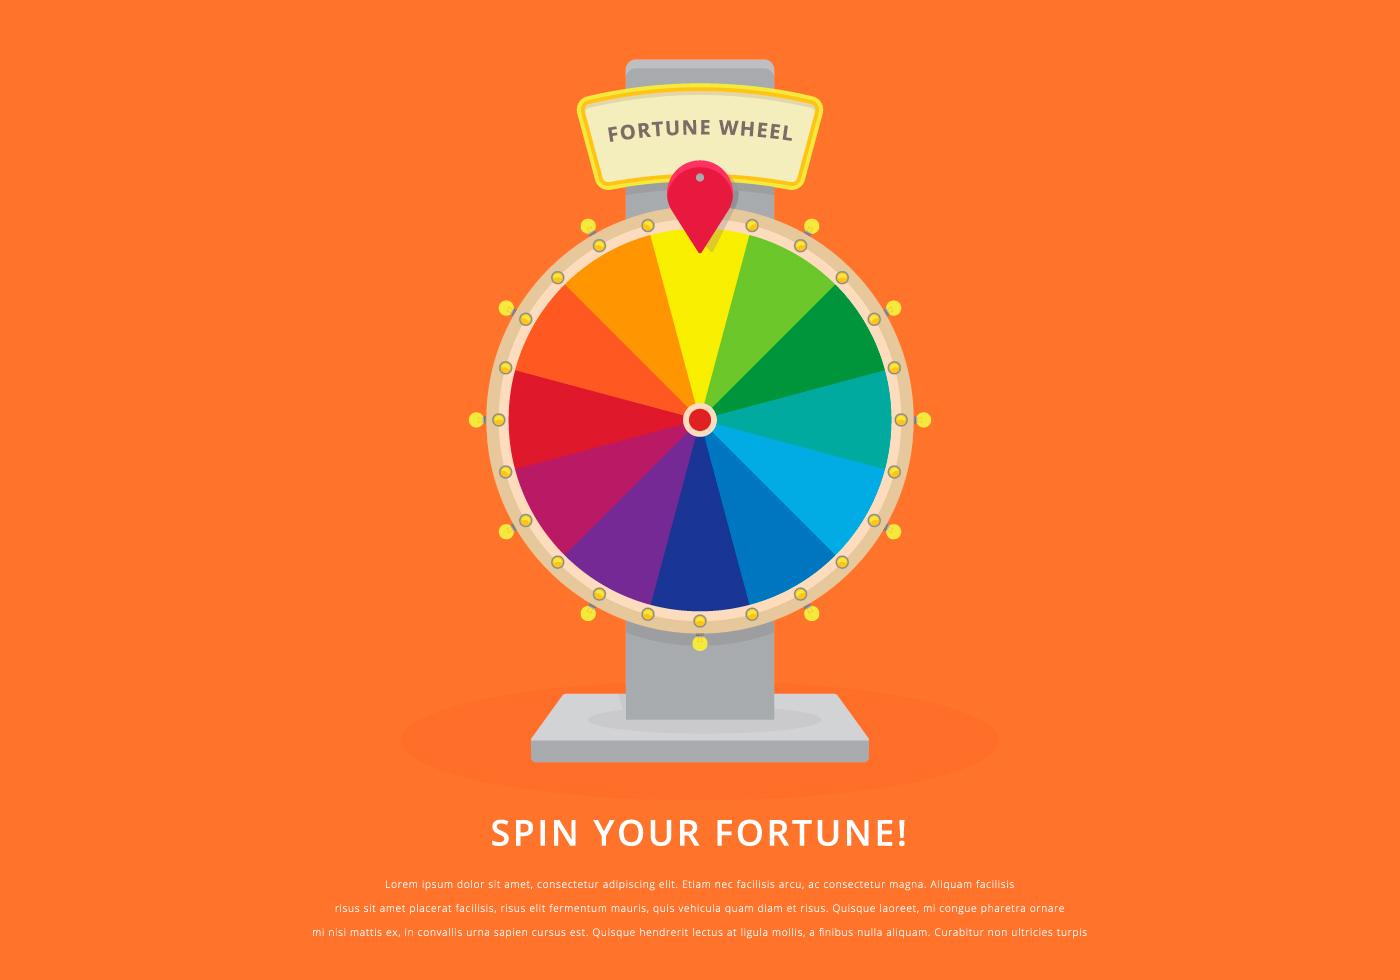 1400x980 Fortune Wheel Free Vector Art